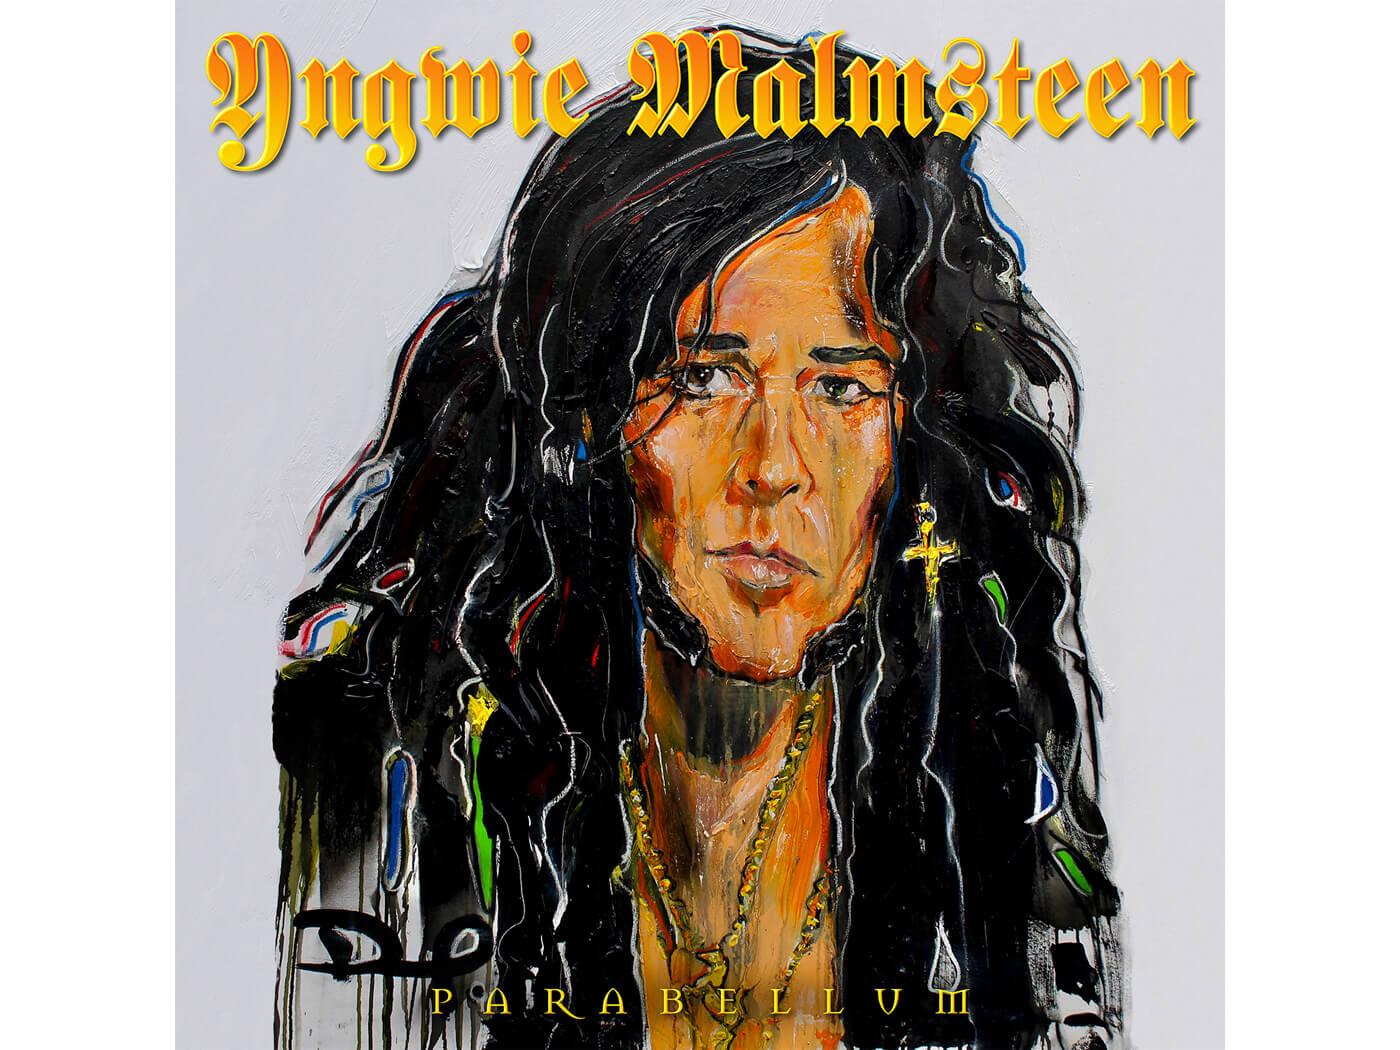 Yngwie Malmsteen's Parabellum